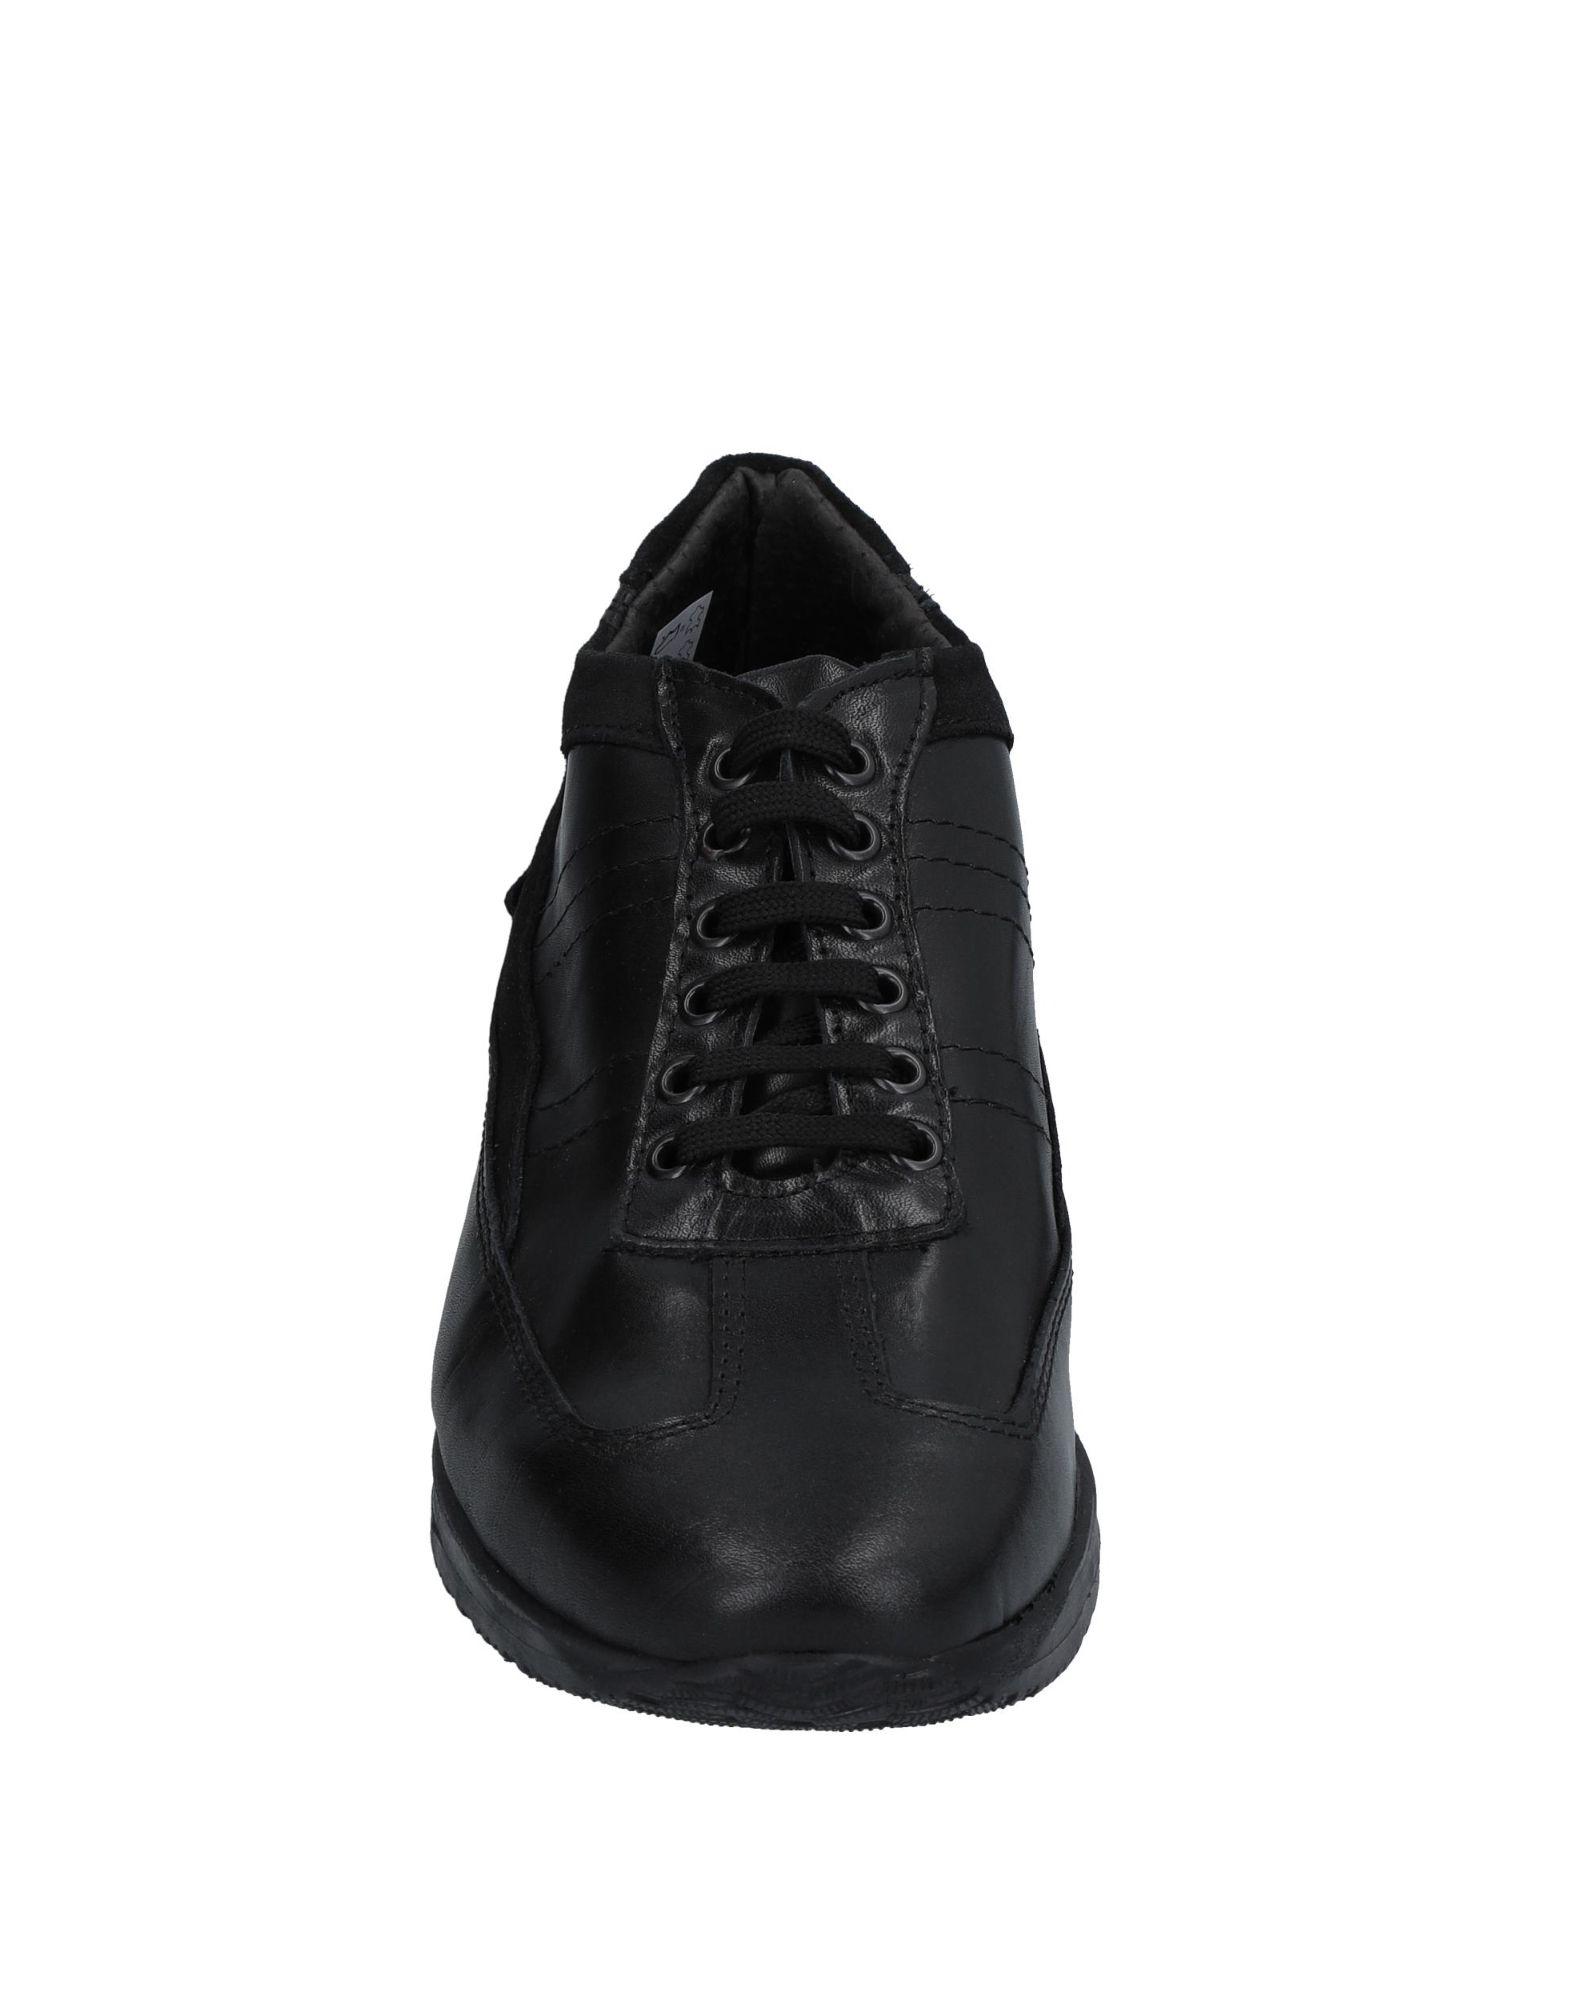 Rabatt echte Schuhe Roberto Della 11533465HN Croce Sneakers Herren  11533465HN Della dd6f17